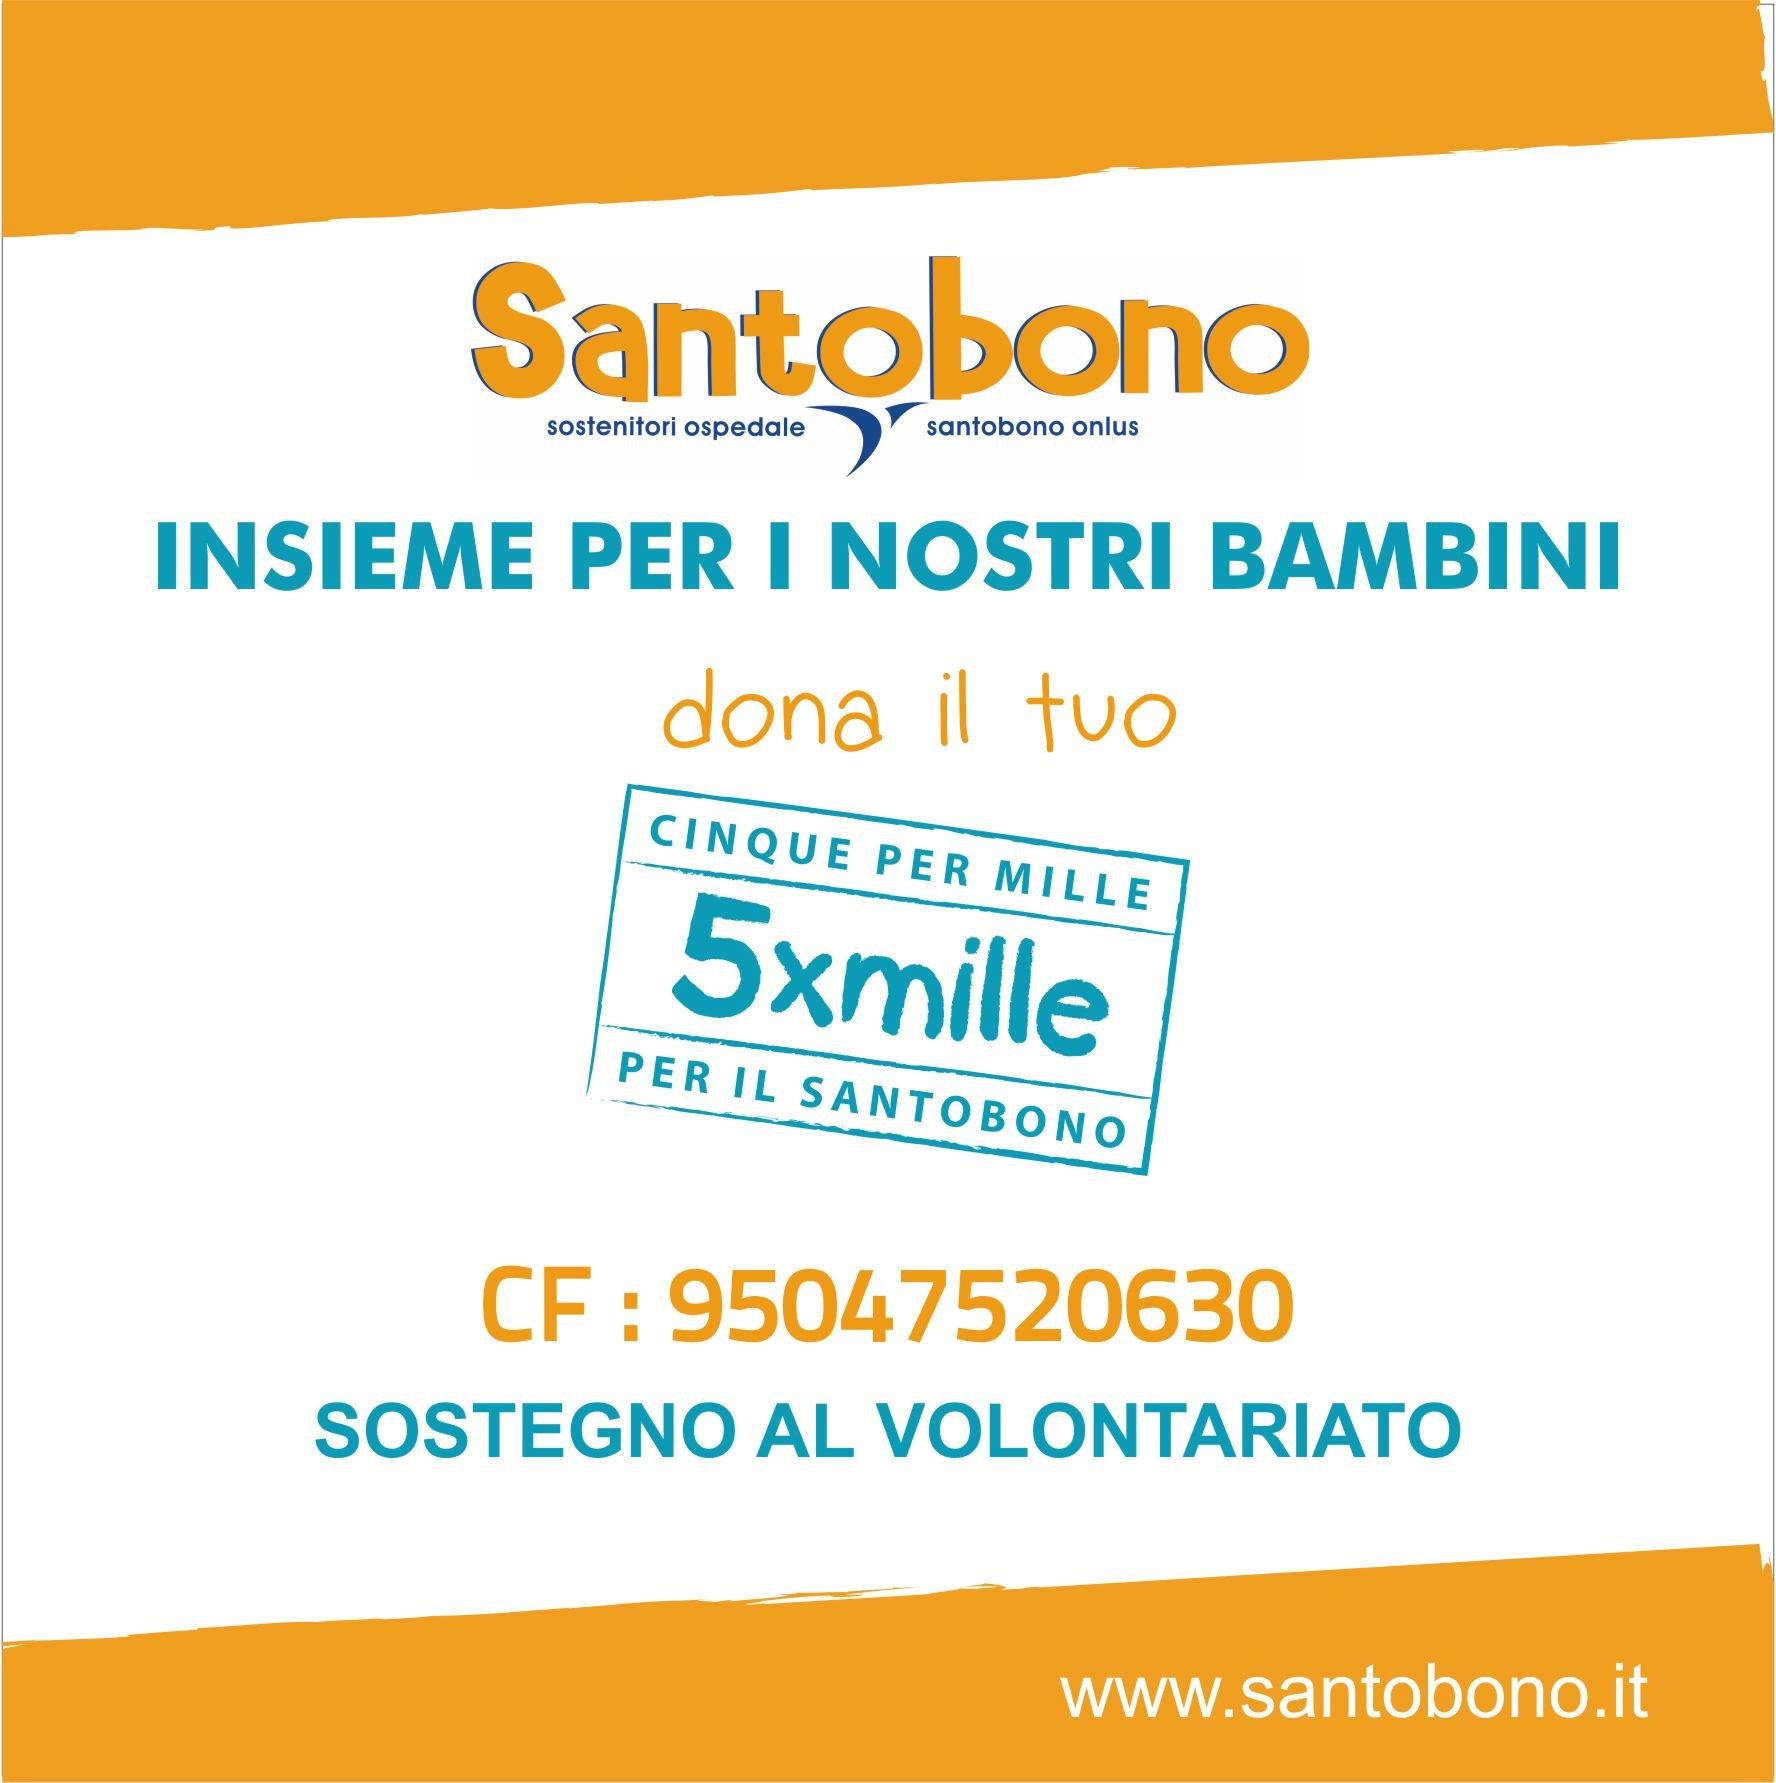 5 Per Mille al Santobono | CF 95047520630 | sez. SOSTEGNO AL VOLONTARIATO